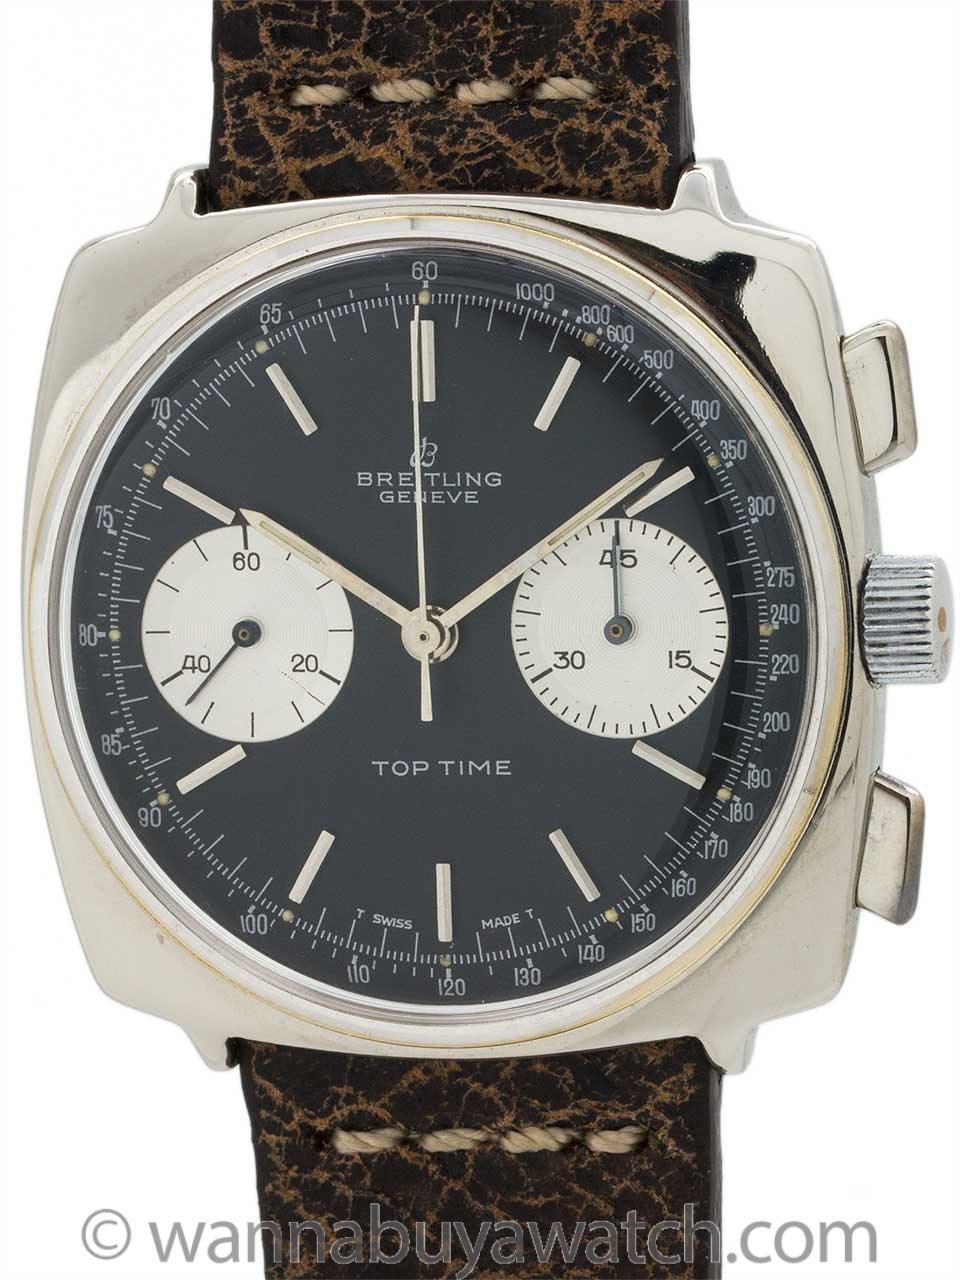 Breitling Top Time Chronograph Reverse Panda circa 1960's